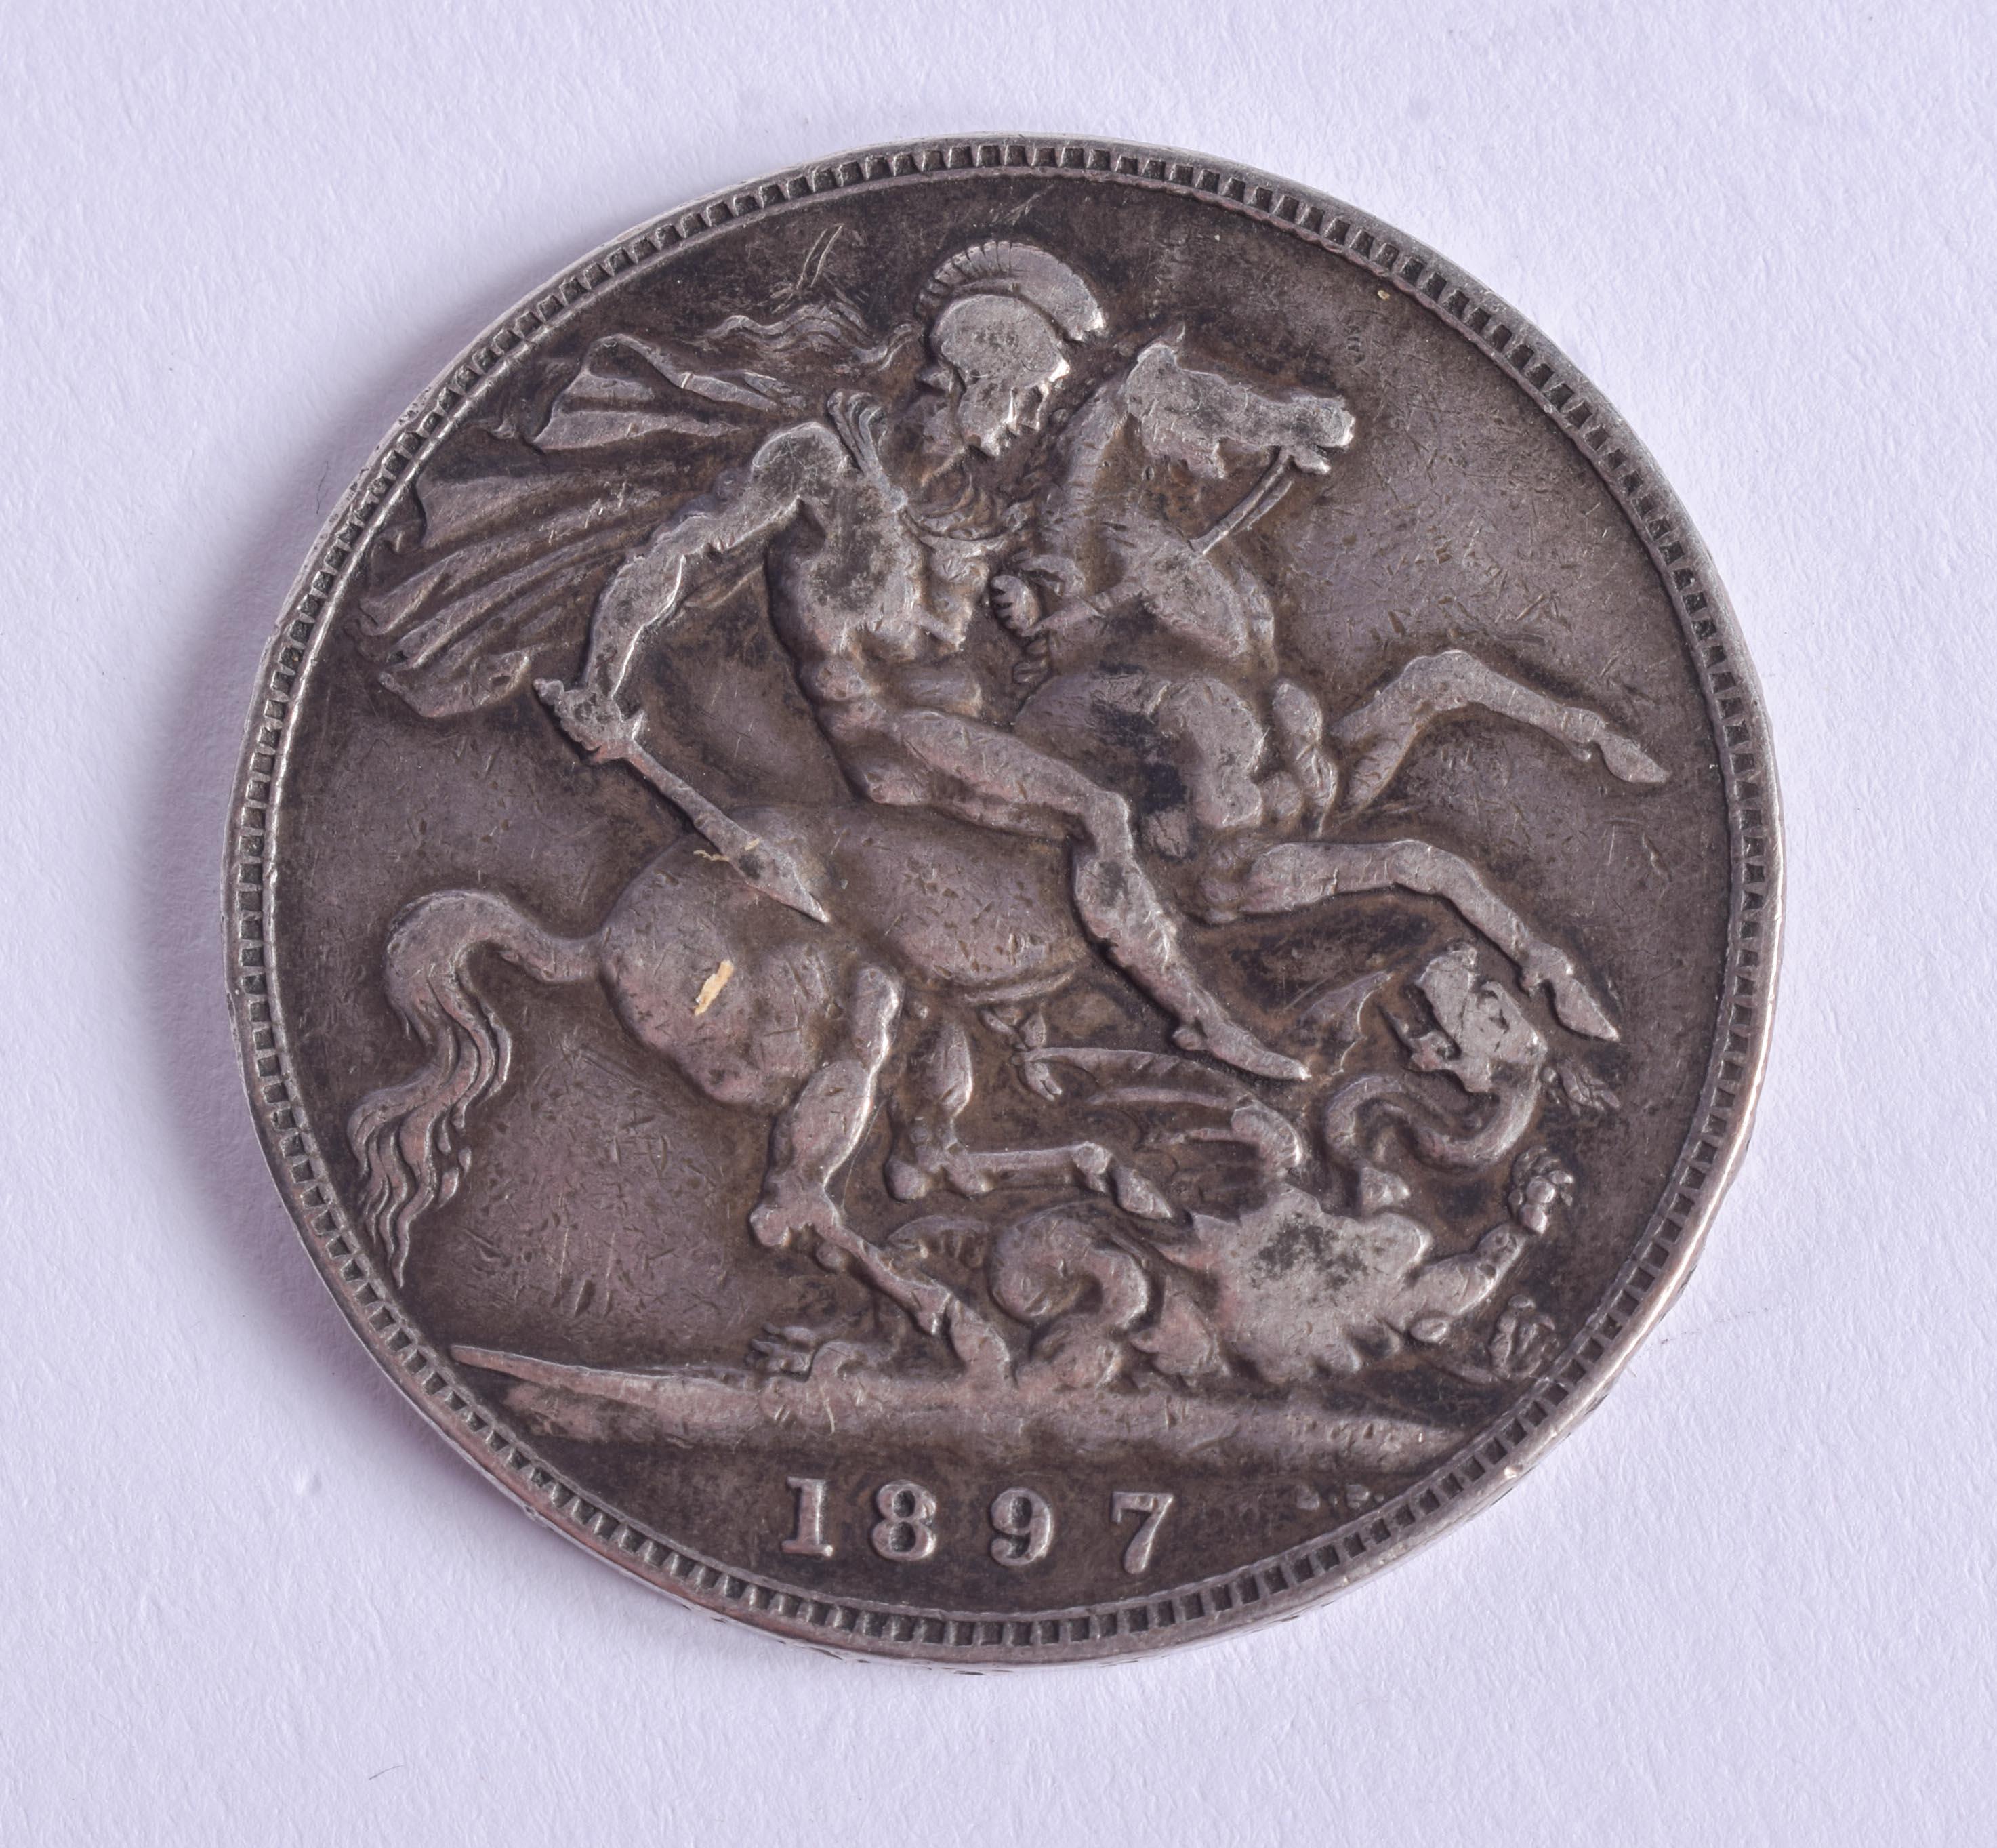 A VICTORIAN 1897 SILVER CROWN.